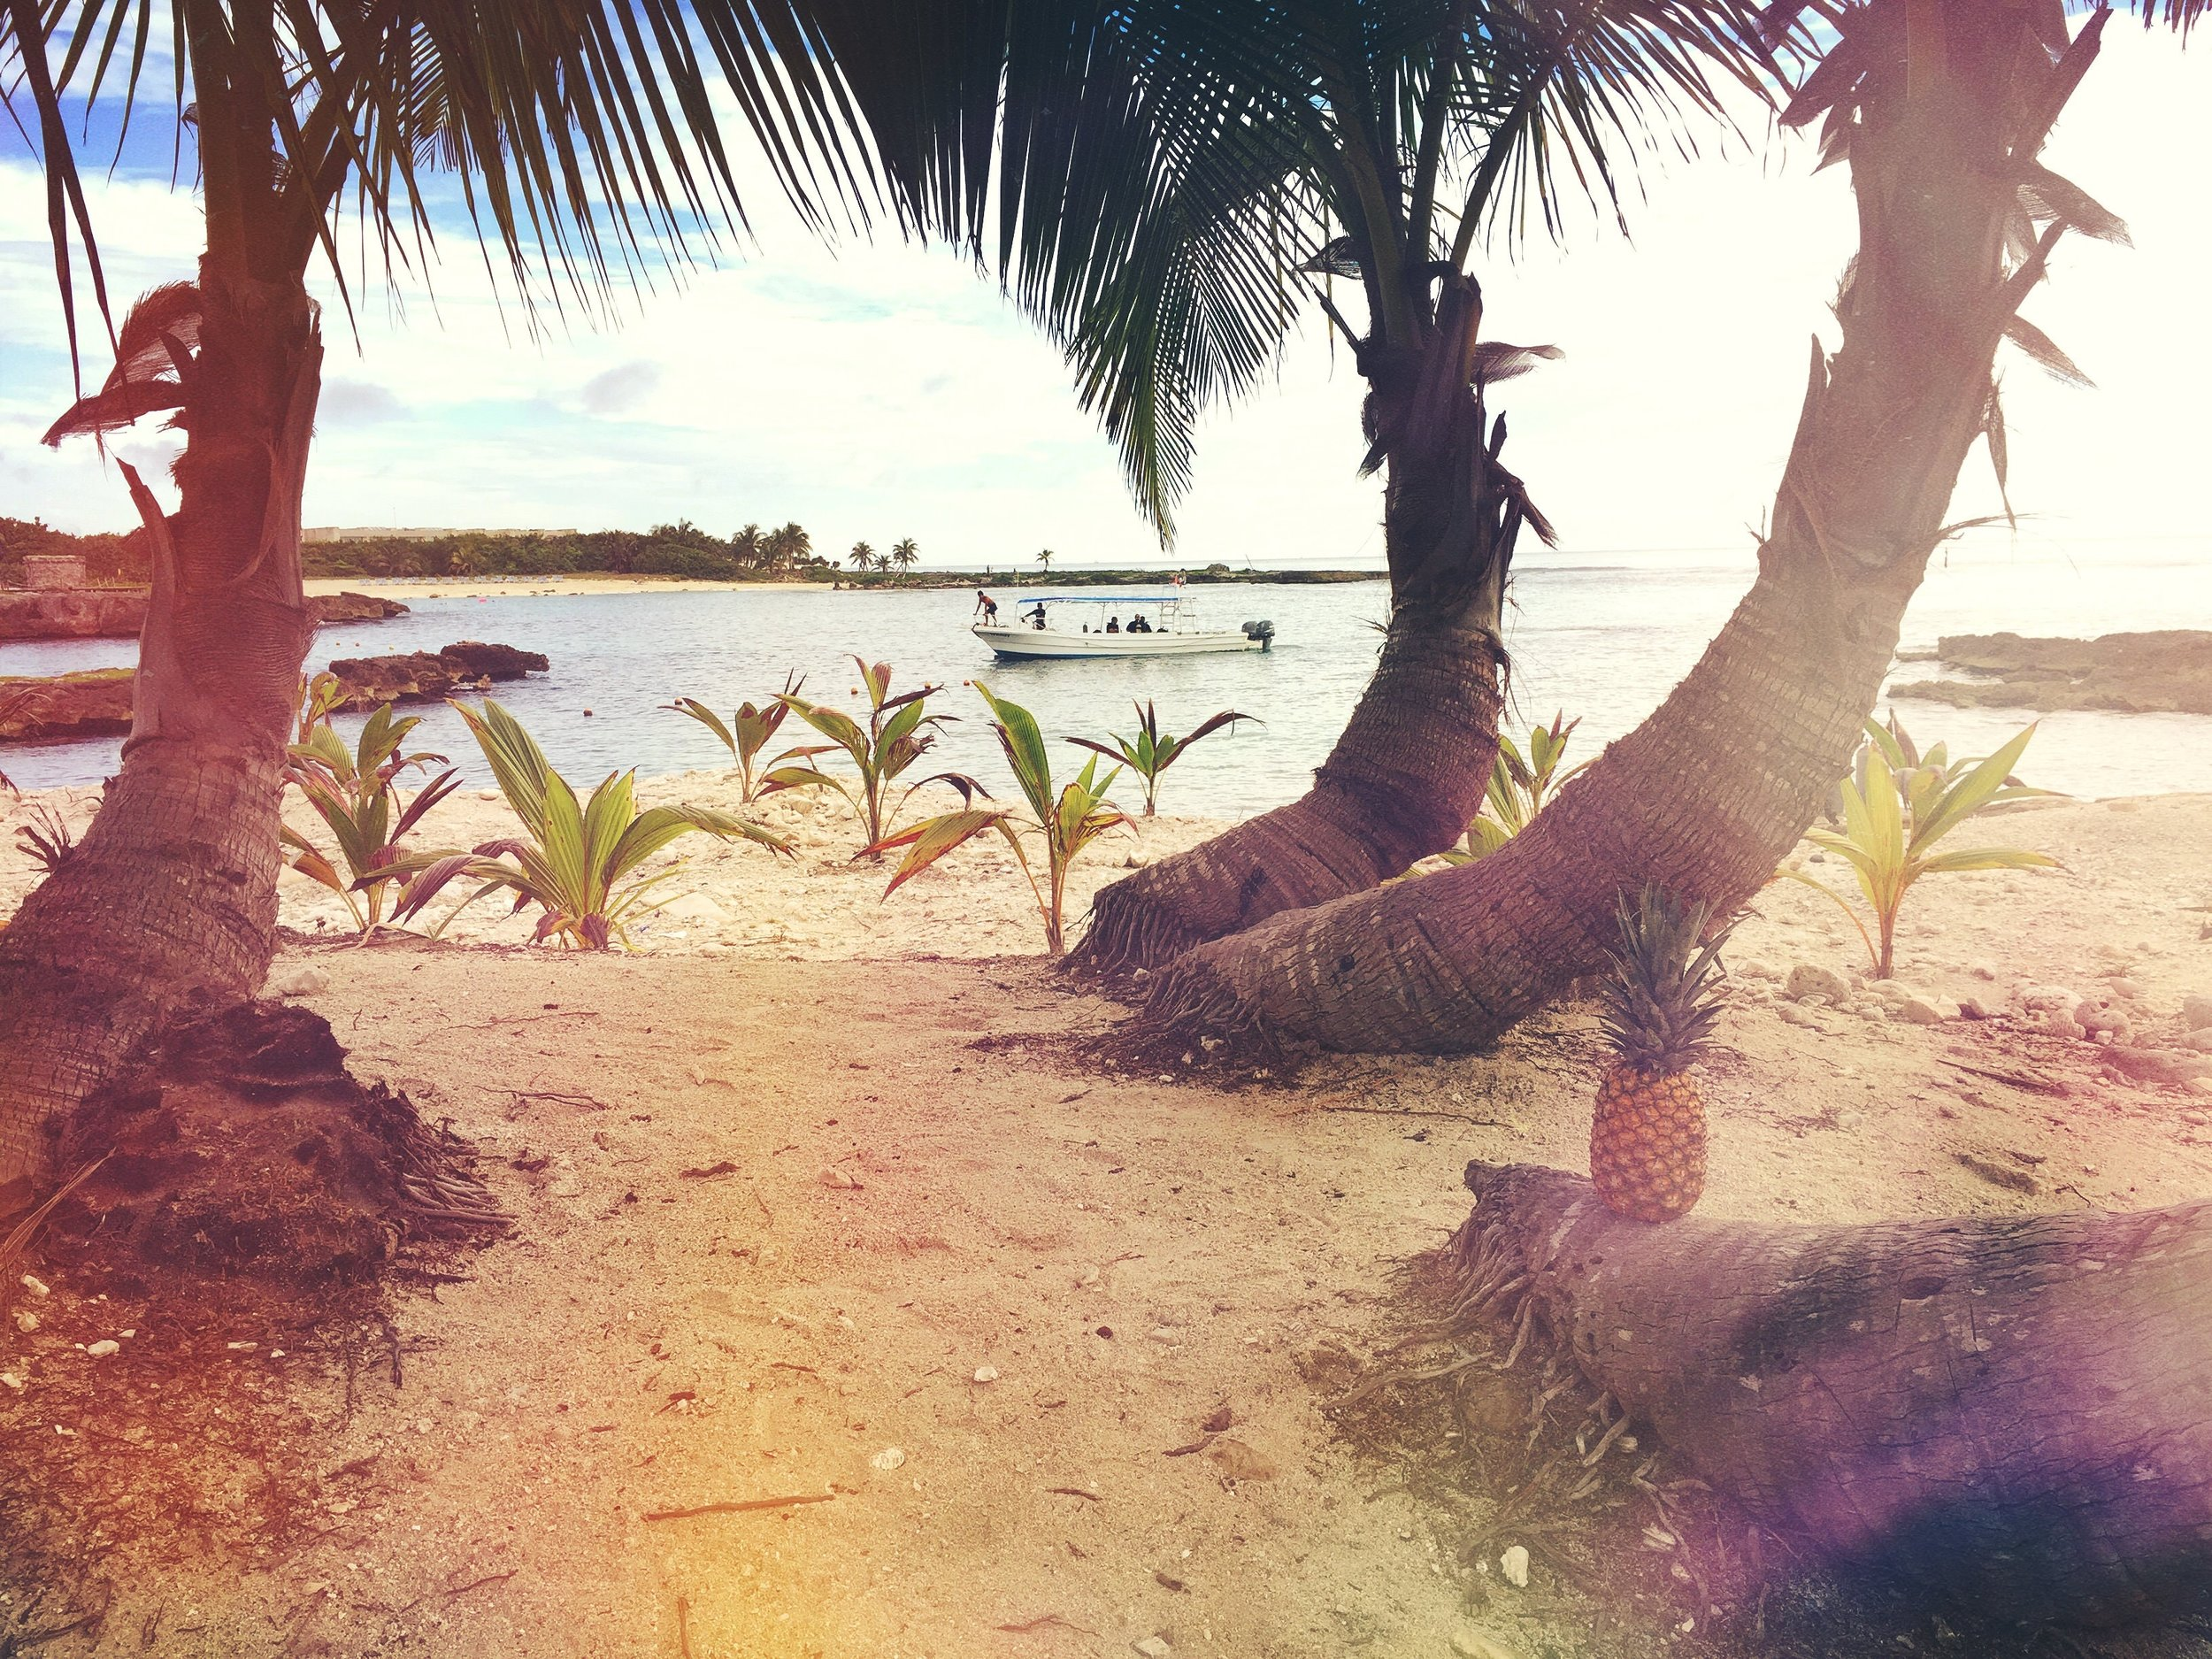 beach-boat-coconut-trees-174641 (2).jpg